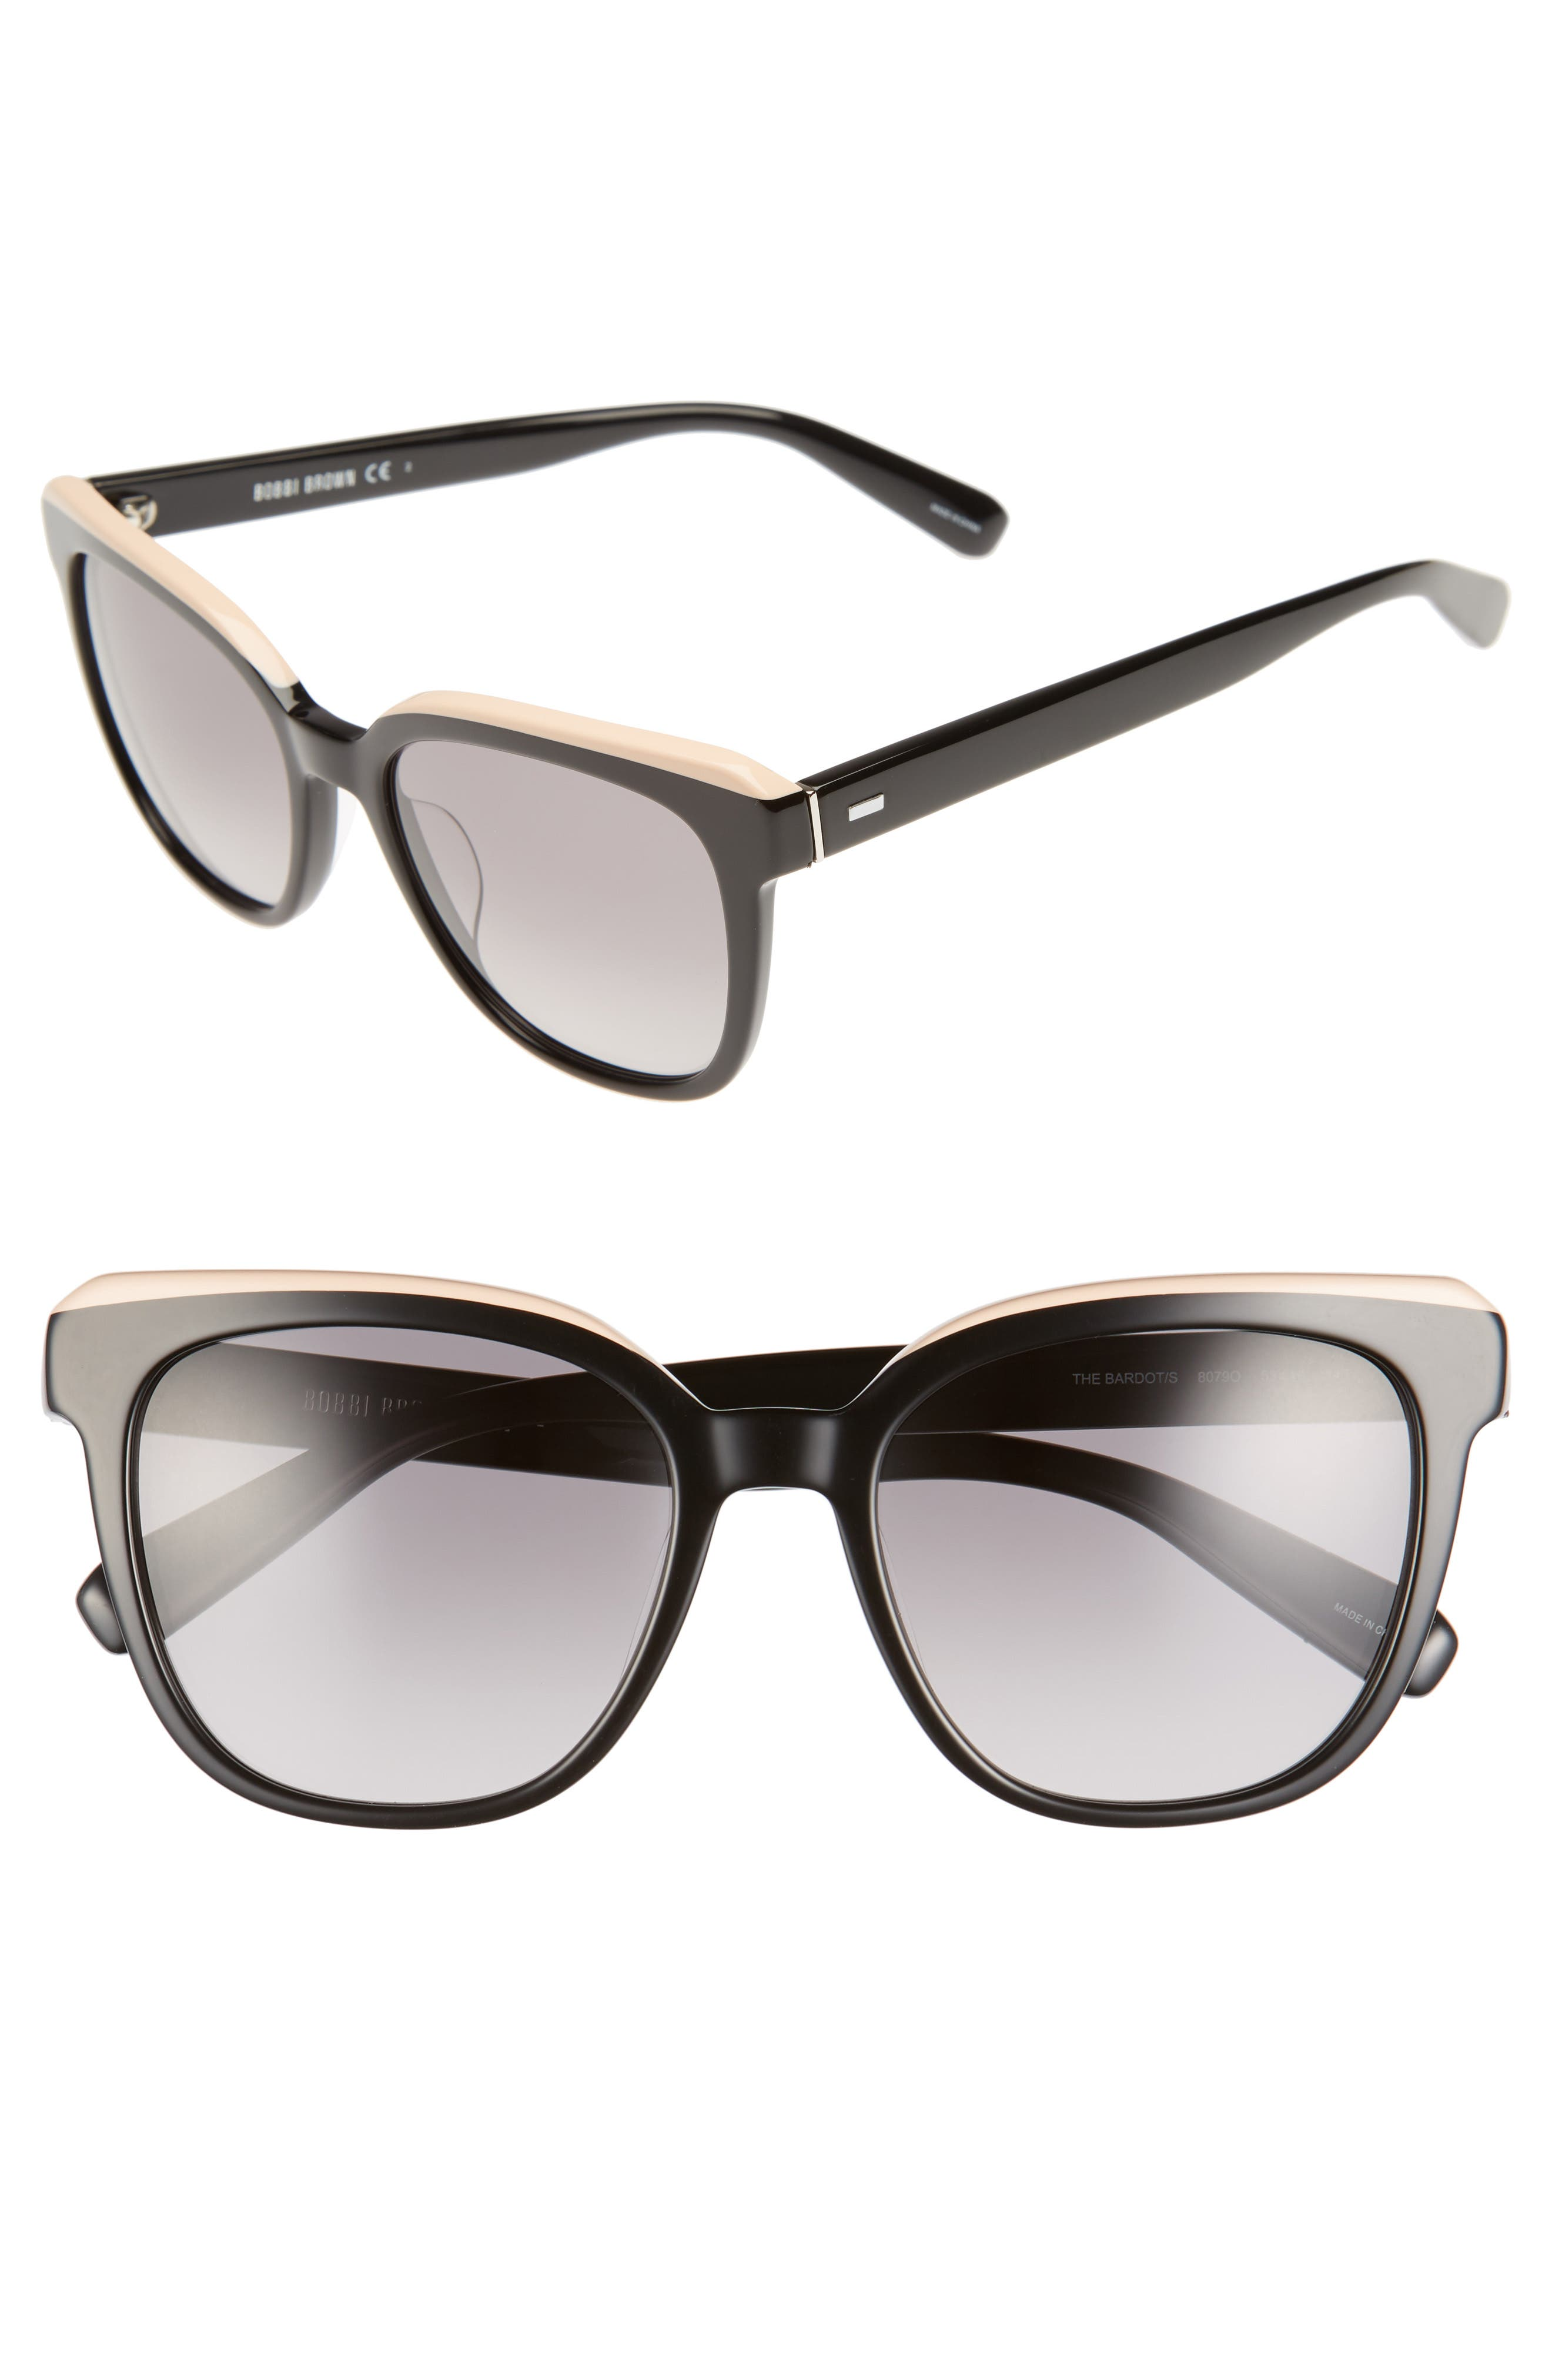 Bobbi Brown The Bardot 53mm Gradient Sunglasses